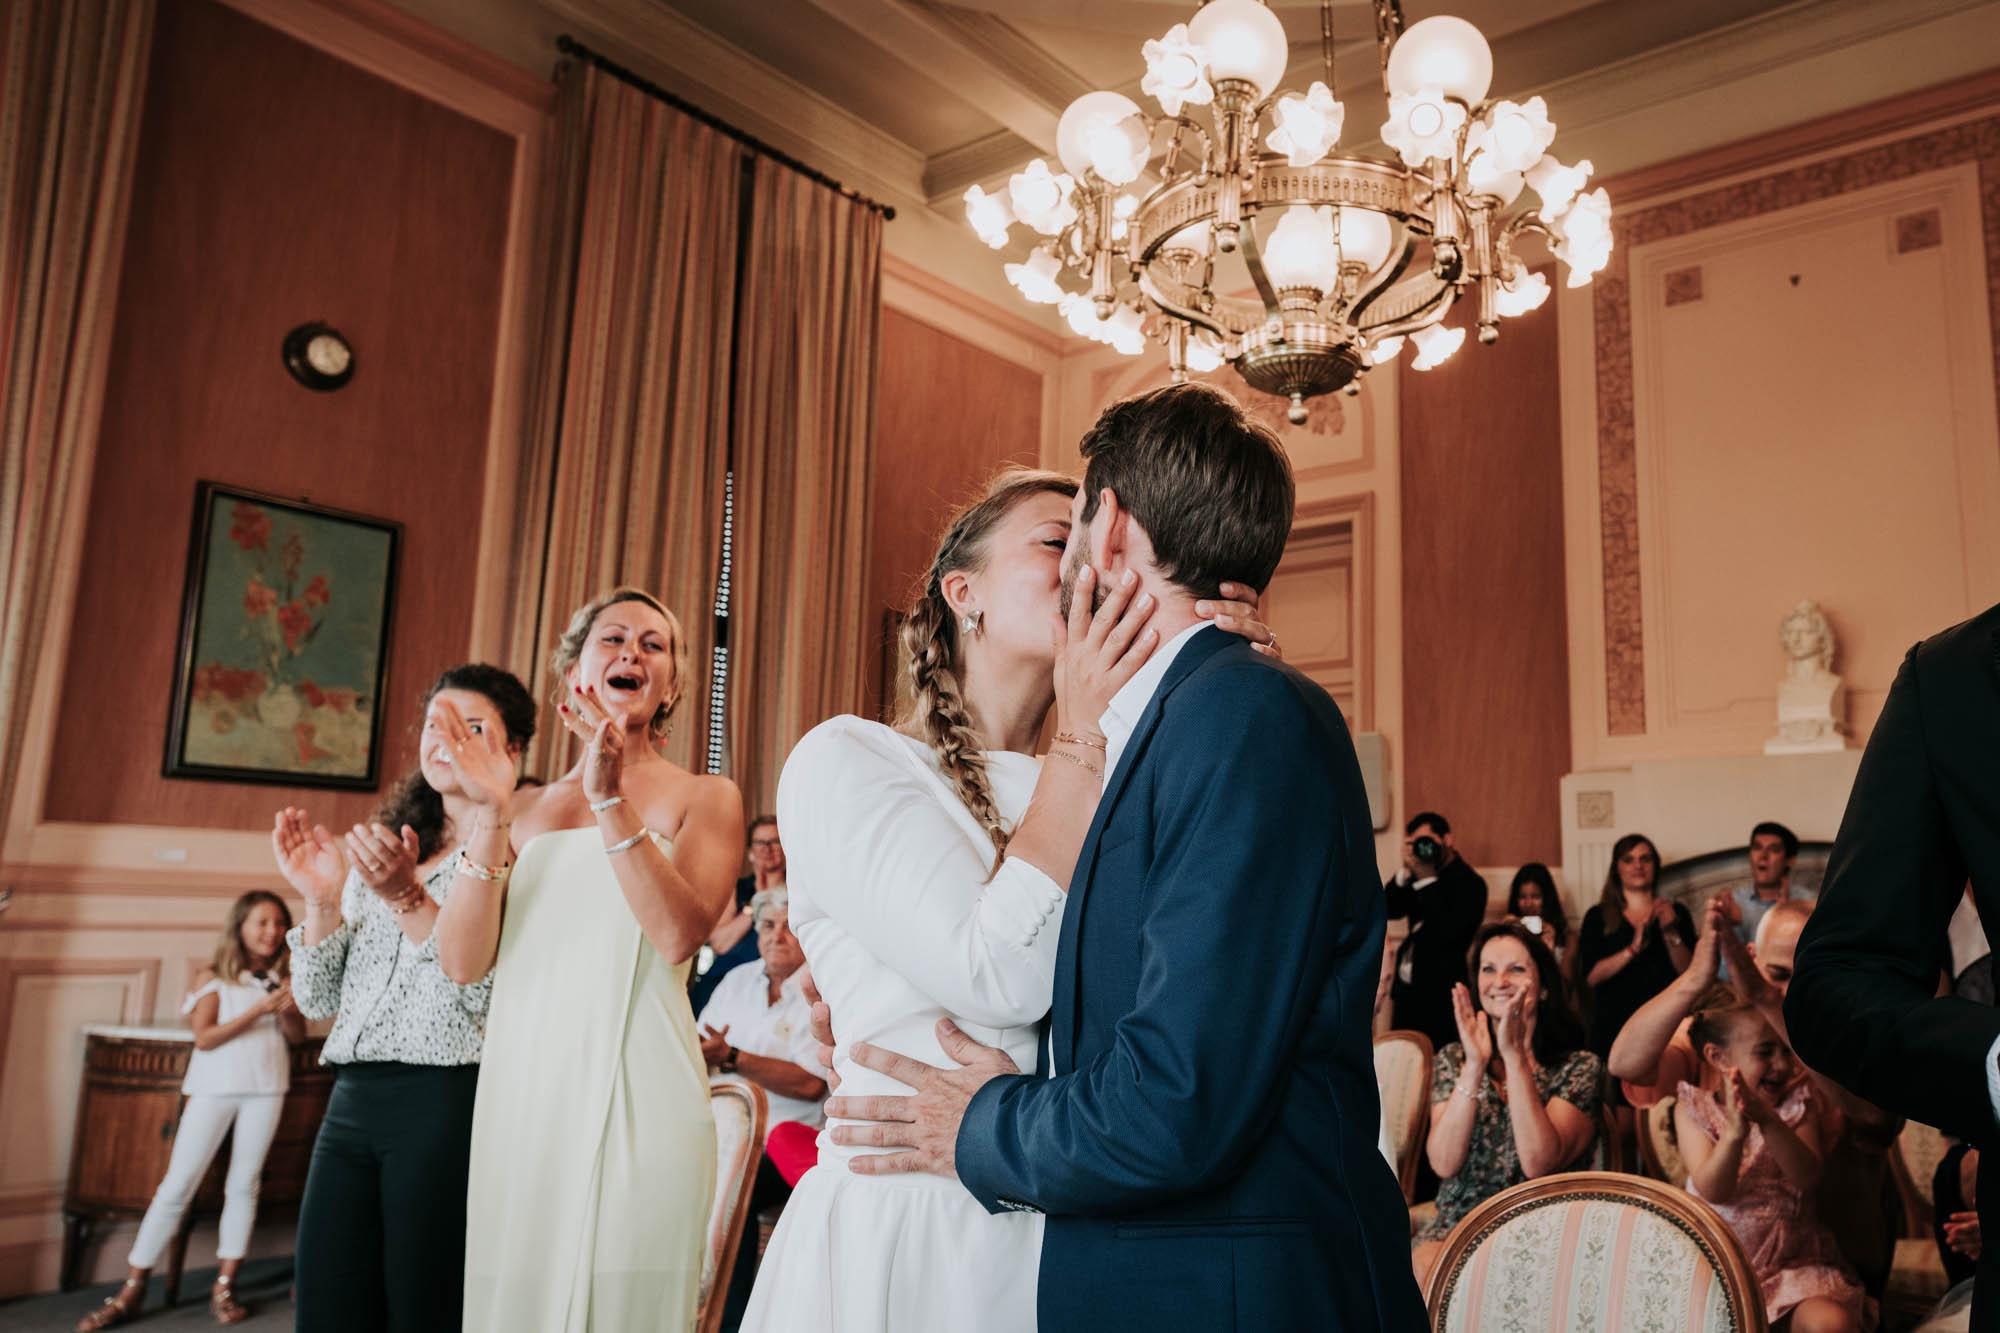 2018-07-21 - LD8_8891 - photographe mariage lyon - laurie diaz - www.lauriediazweeding.com.jpg